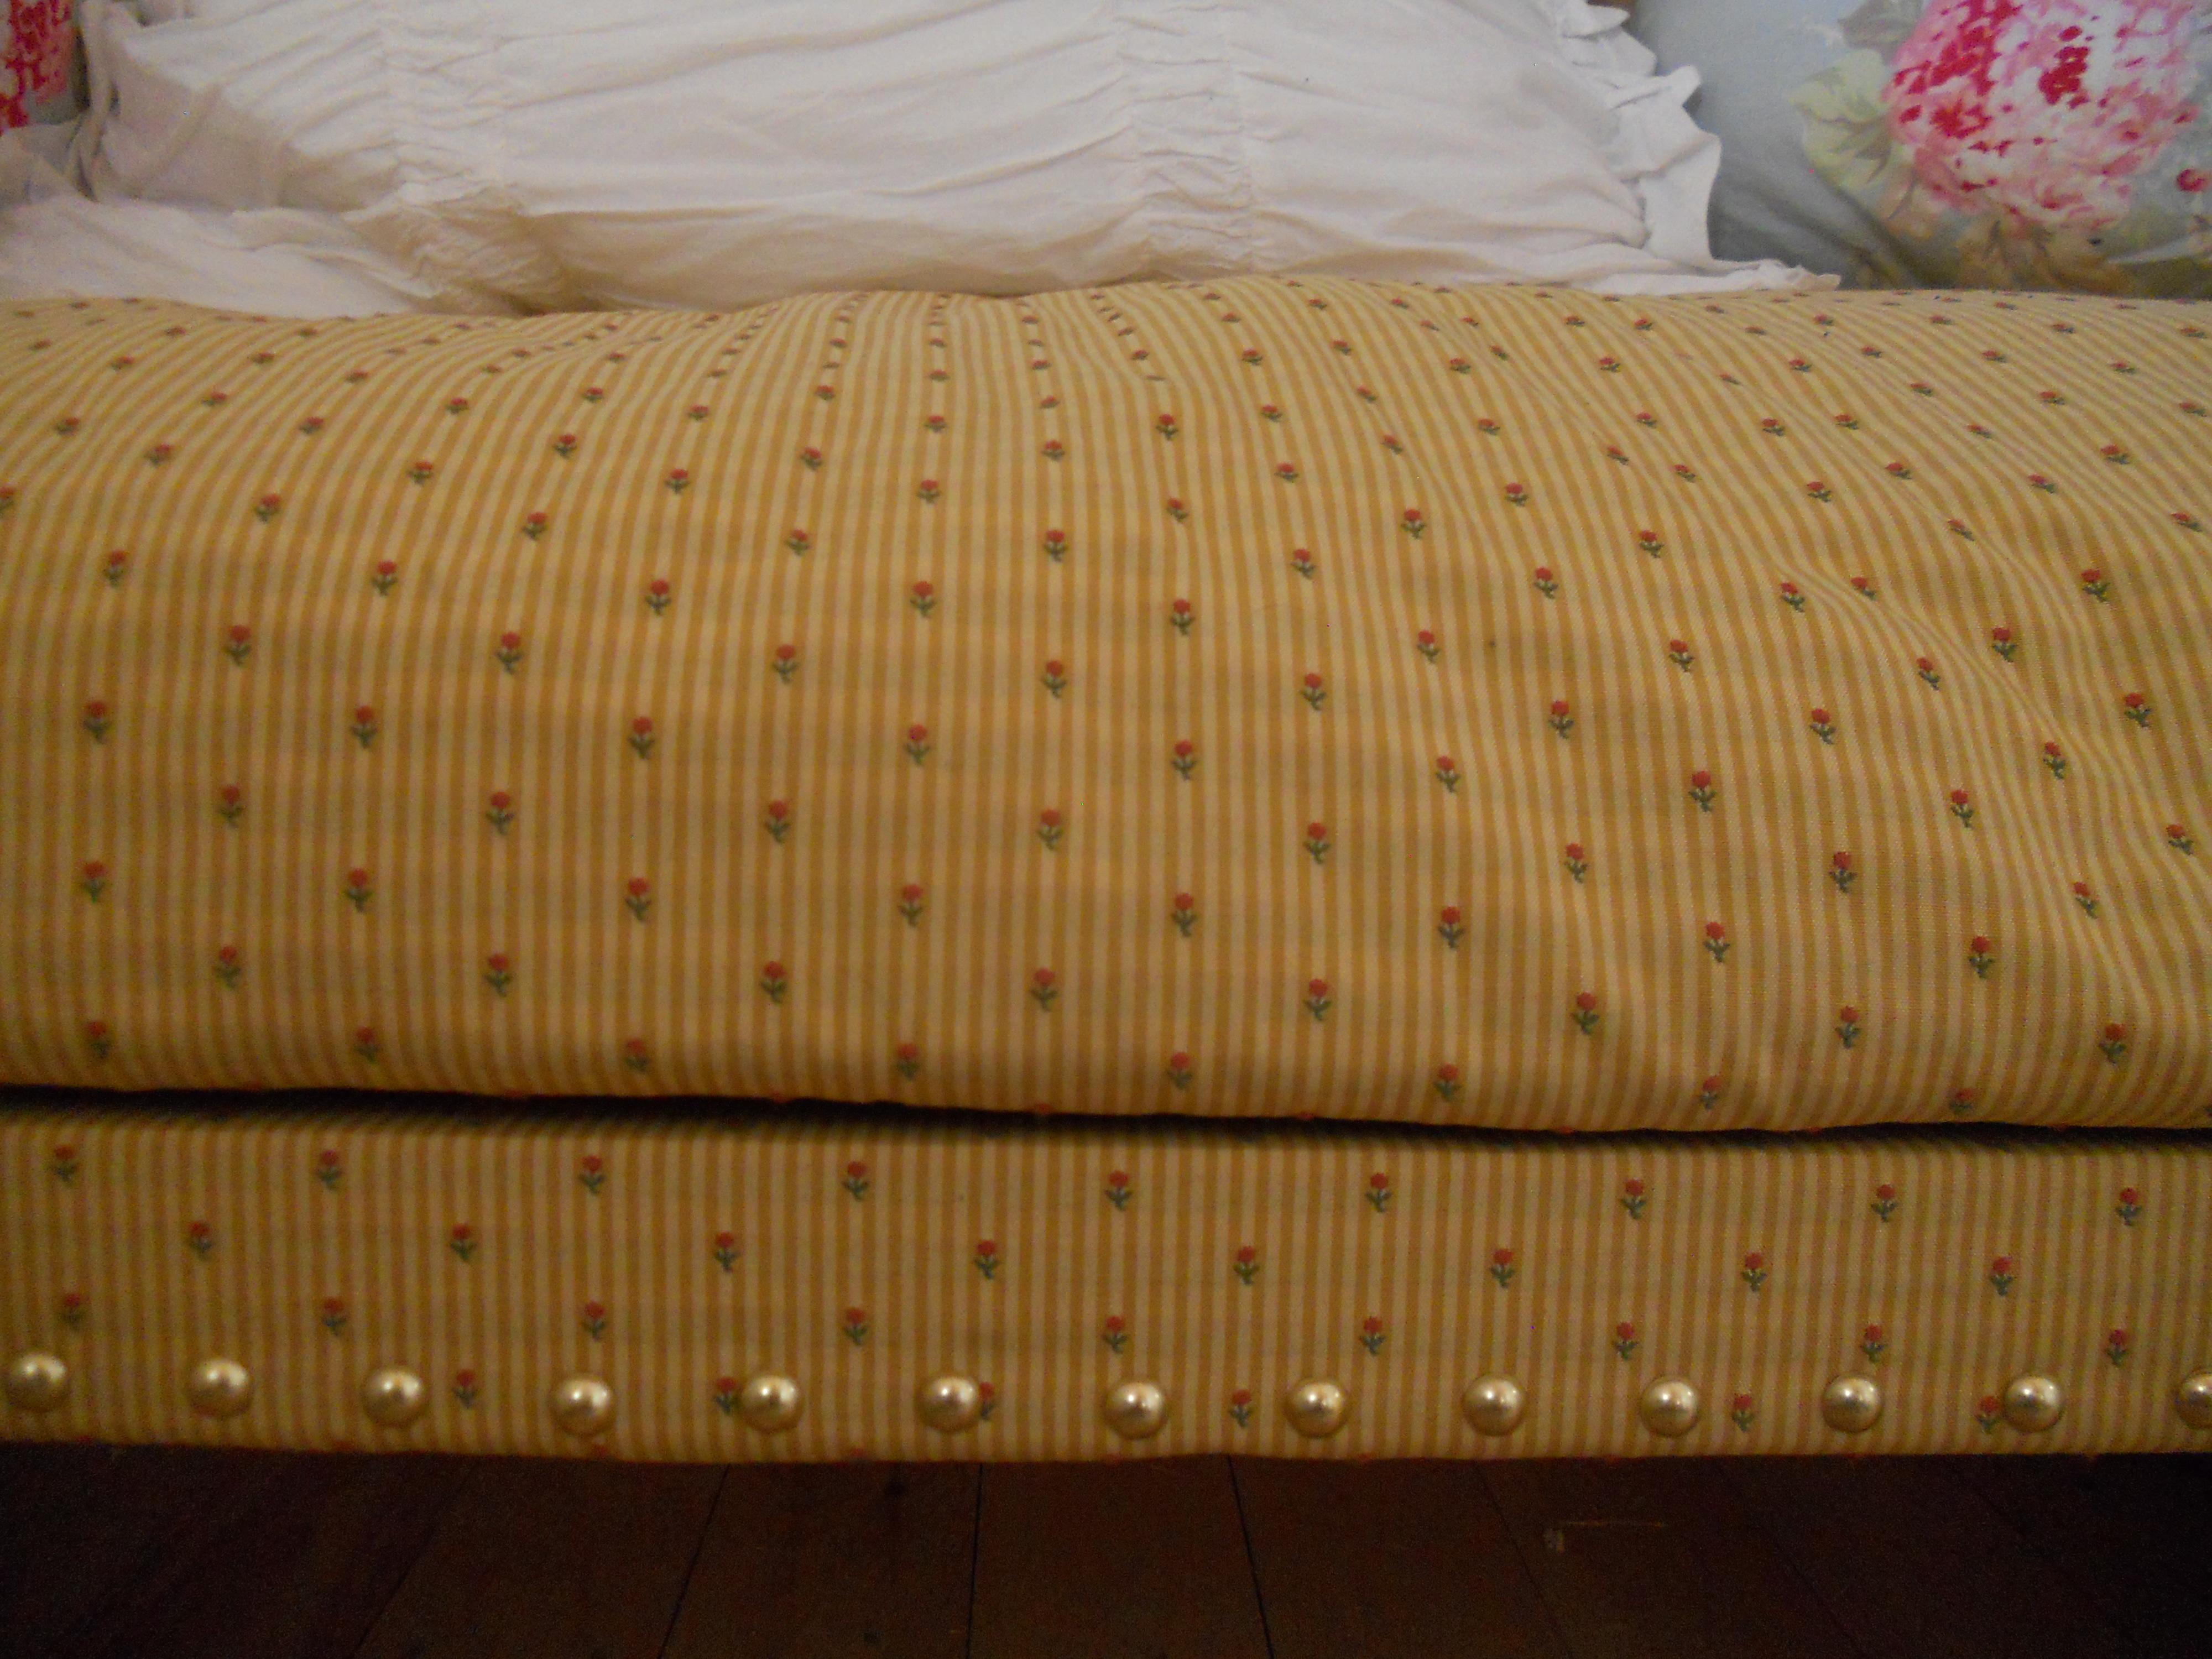 Stuffing Couch Cushions Littleyellowdoor